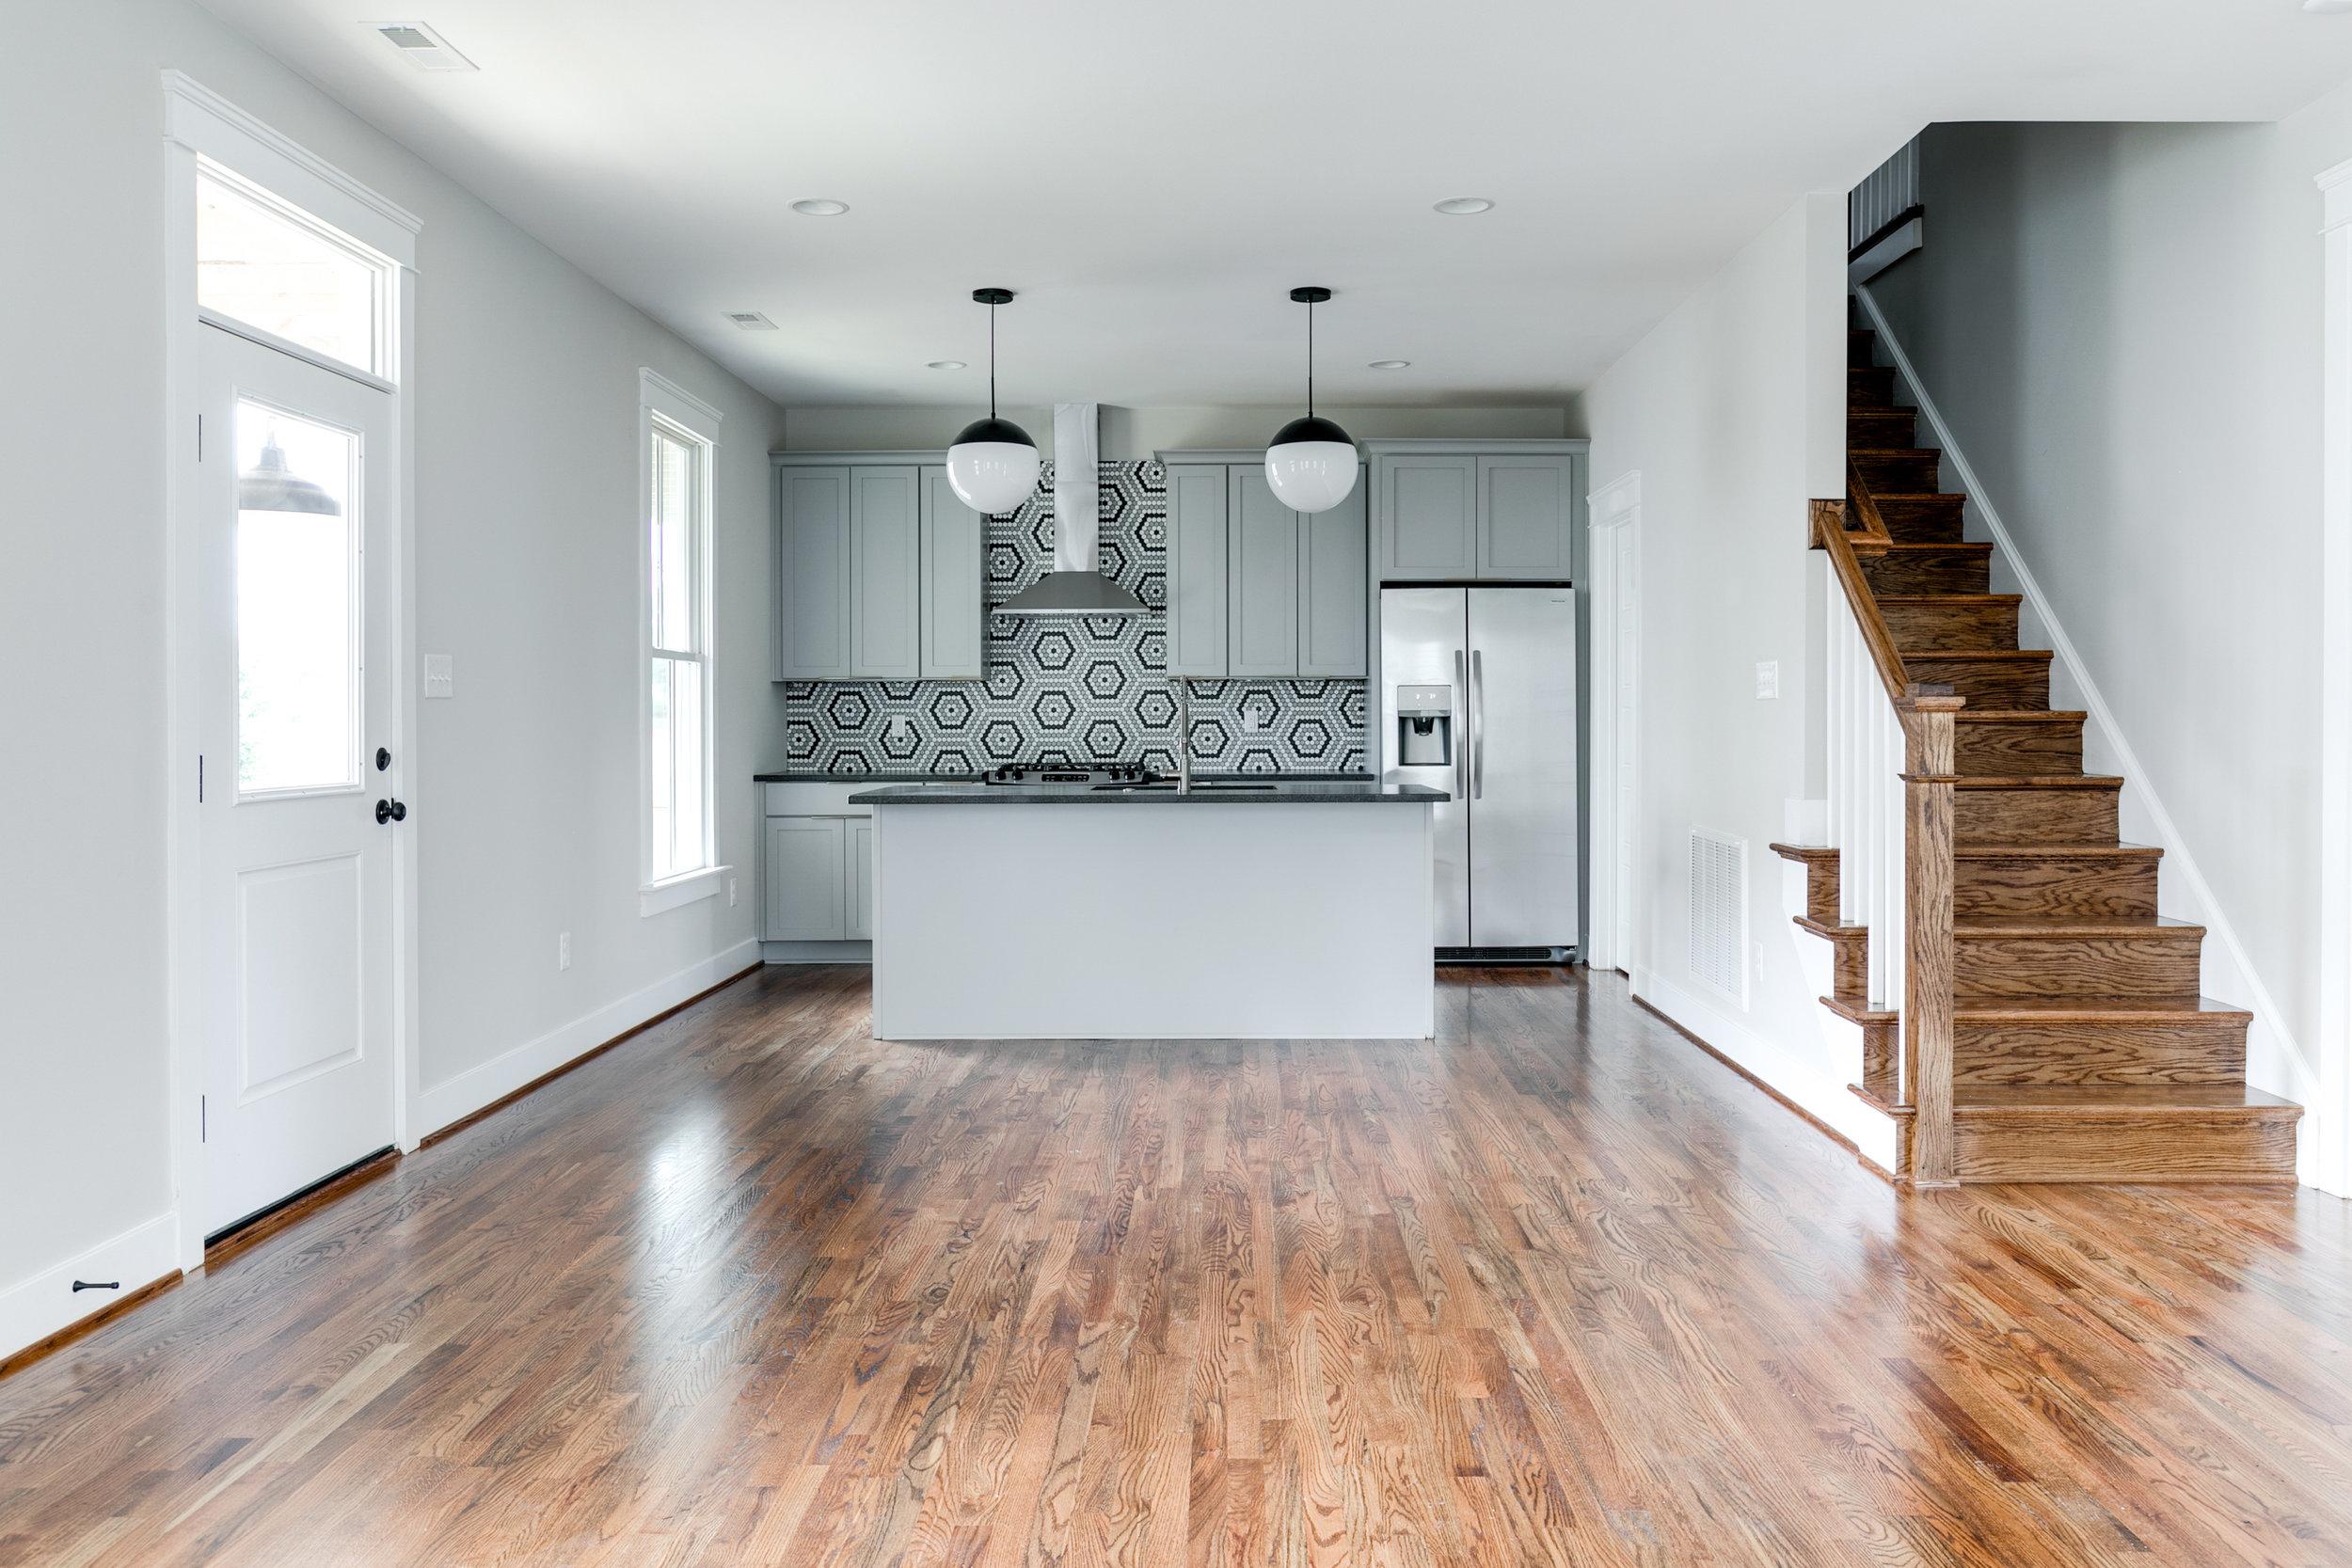 NEW CONSTRUCTION RICHMOND VA - KITCHEN & DINING.jpg